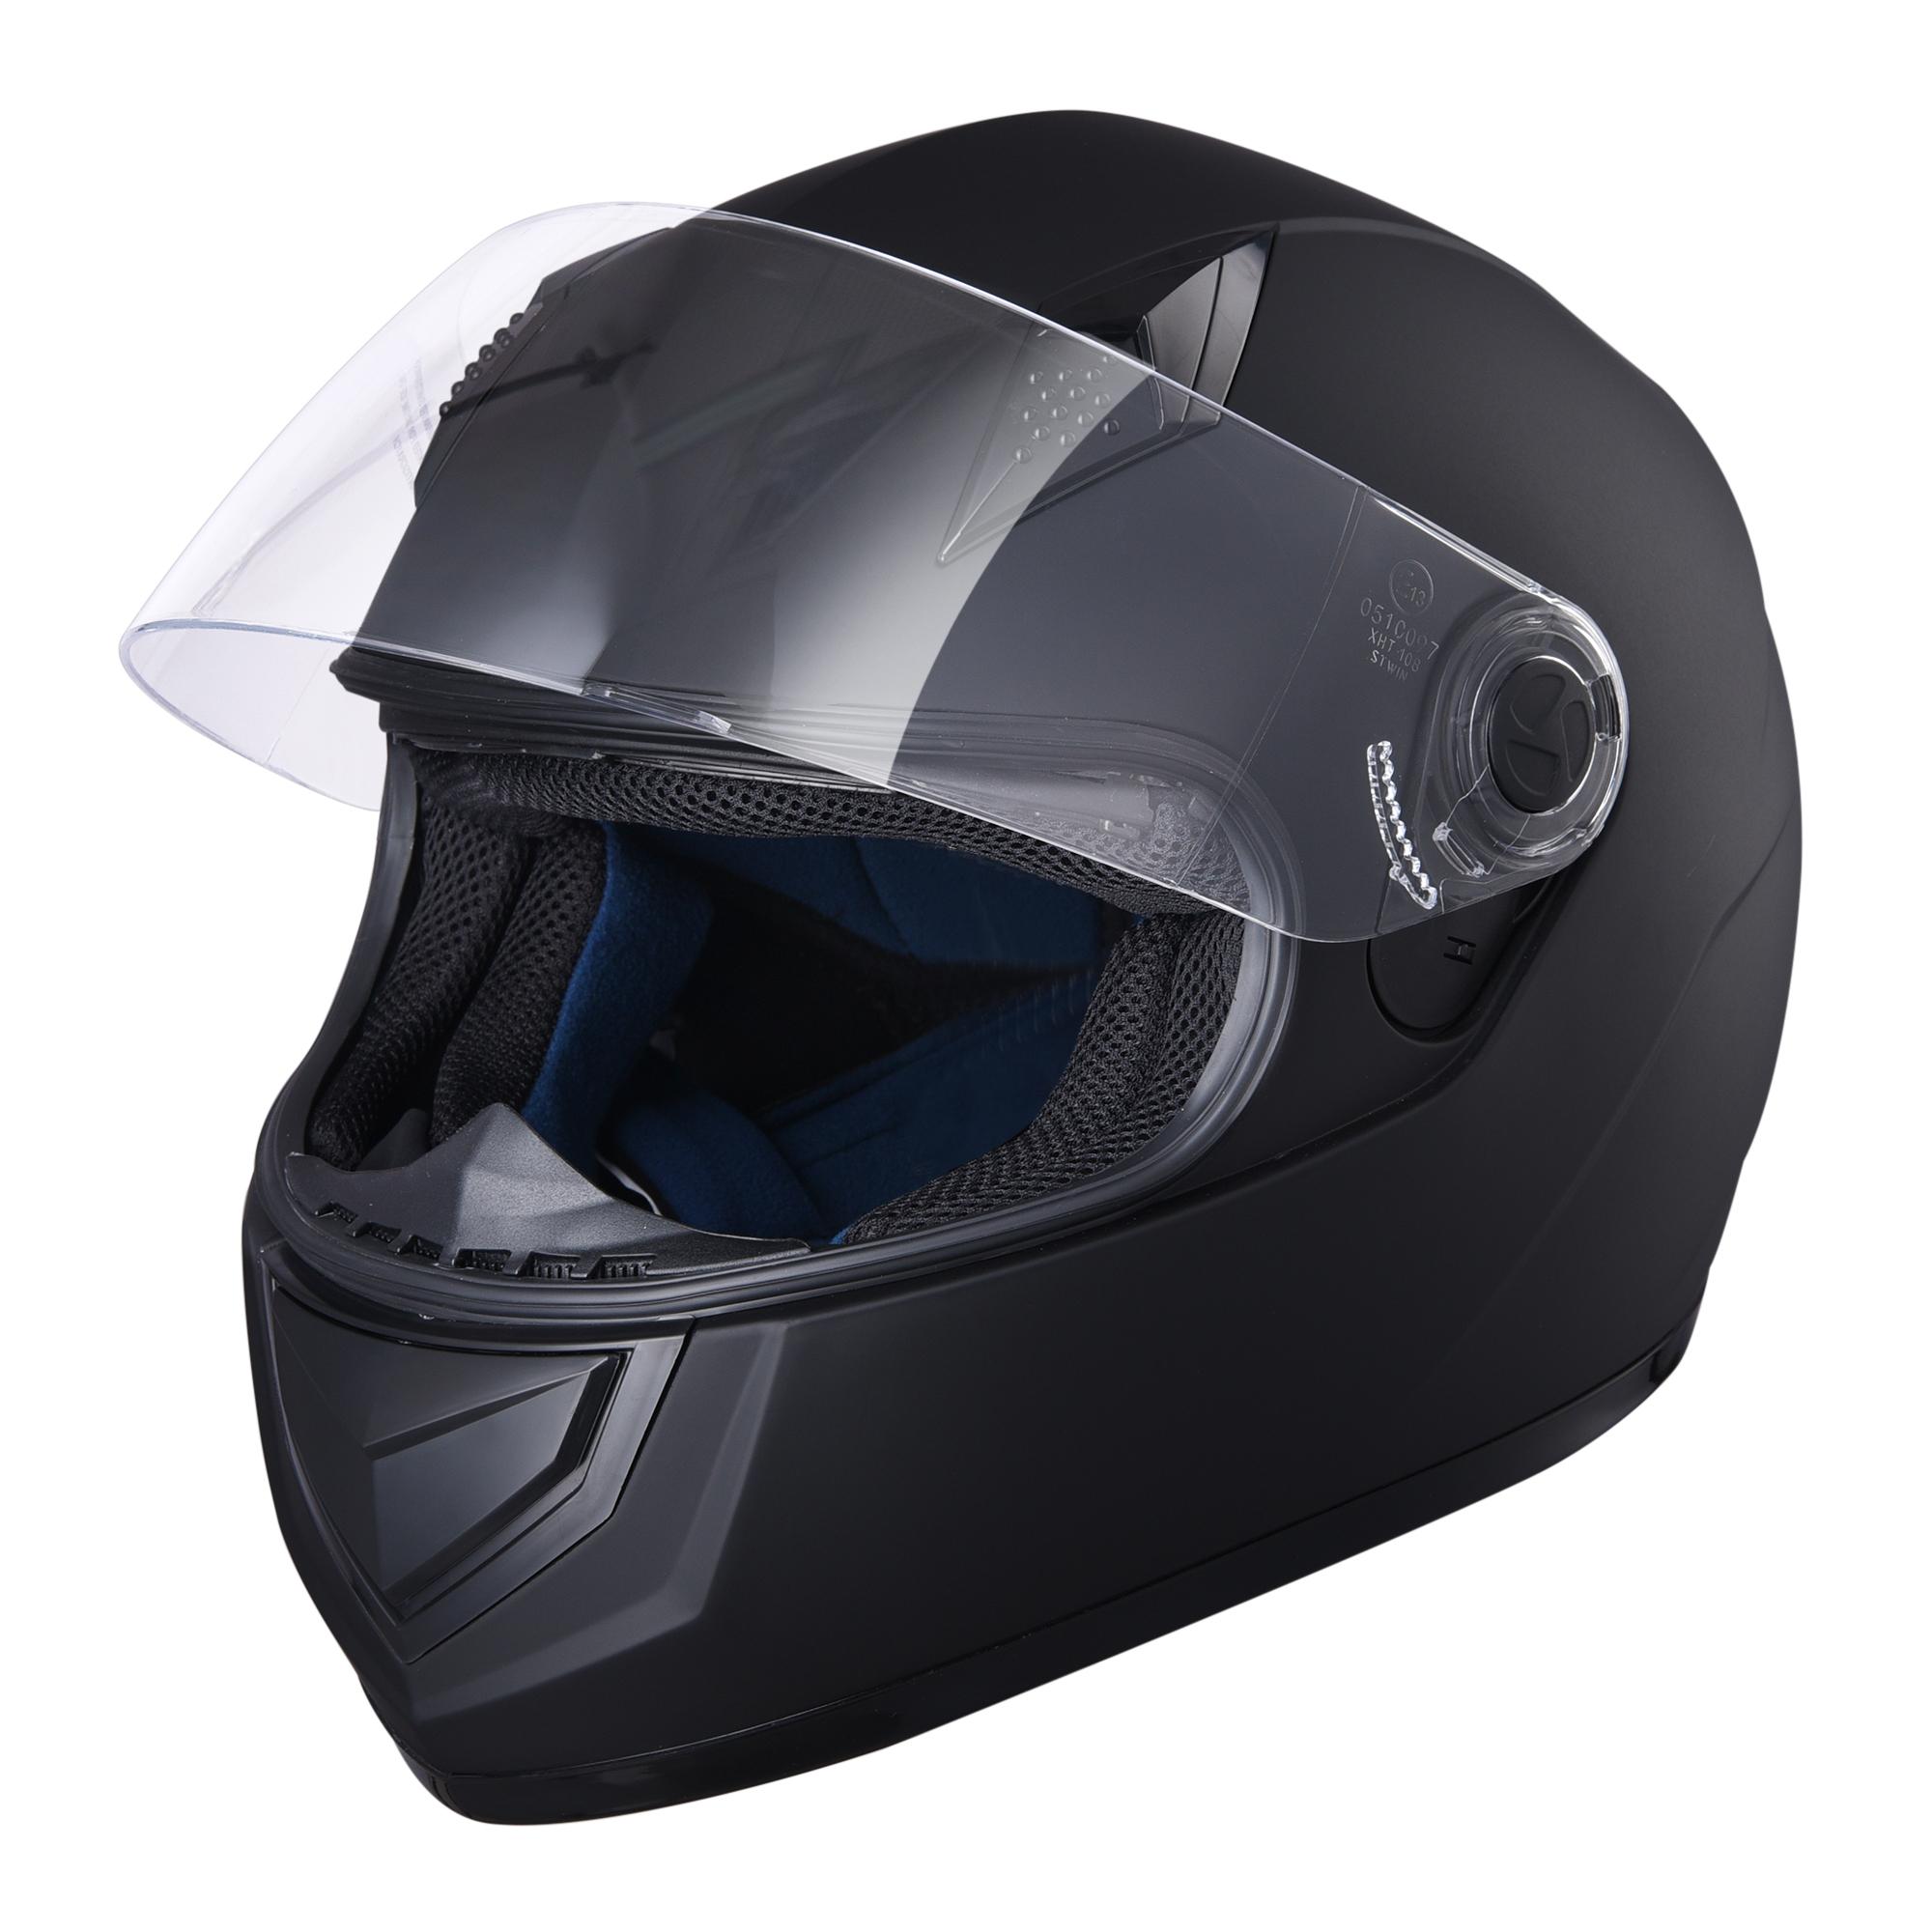 miniature 26 - AHR K12 Full Face Motorcycle Helmet DOT Air Vents Clear Visor Racing S M L XL